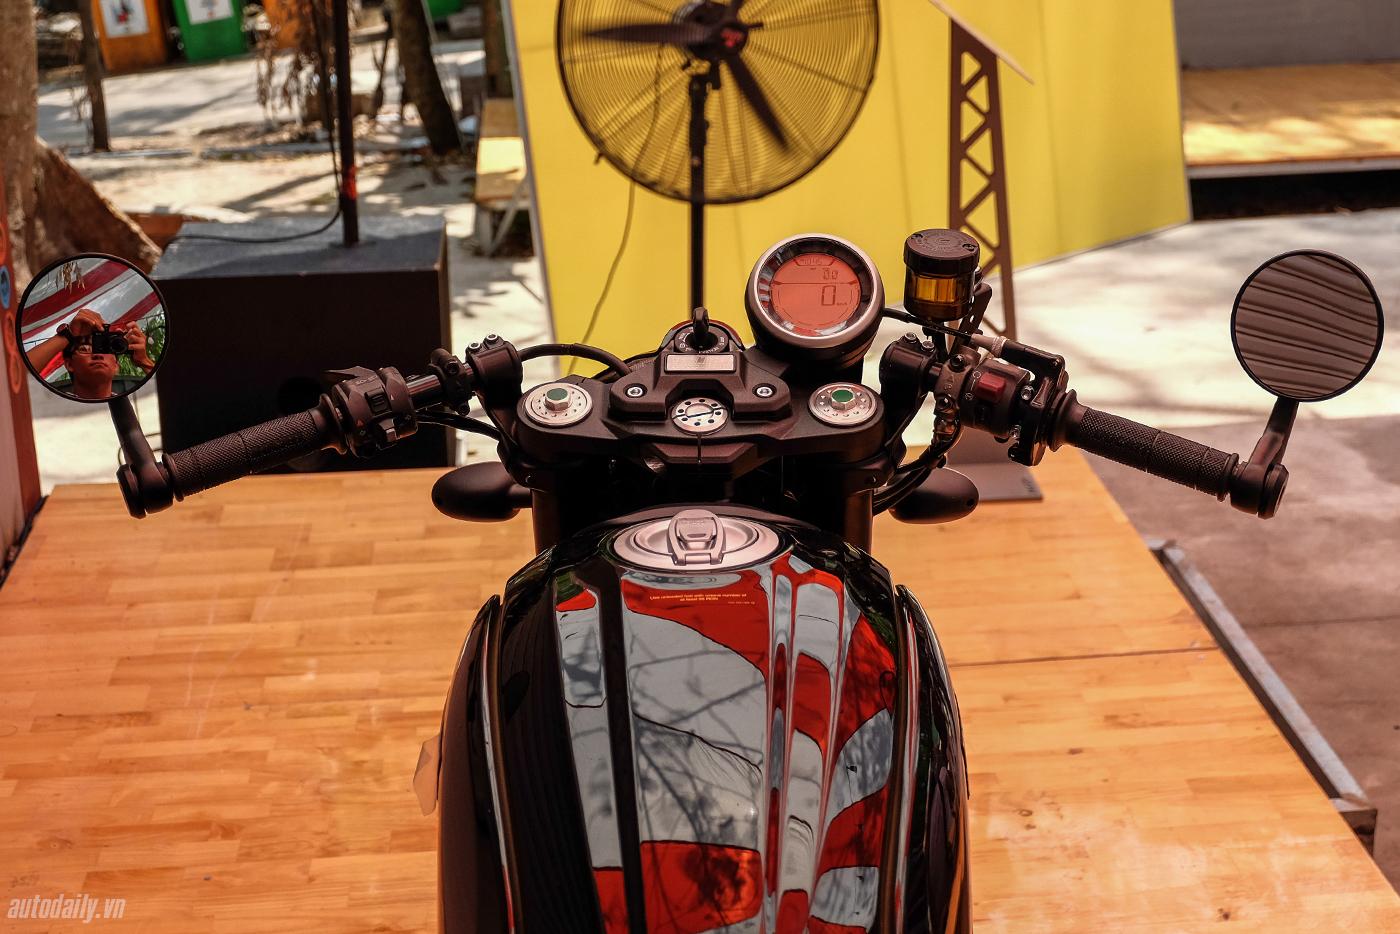 ducati-scrambler-cafe-racer-30.jpg